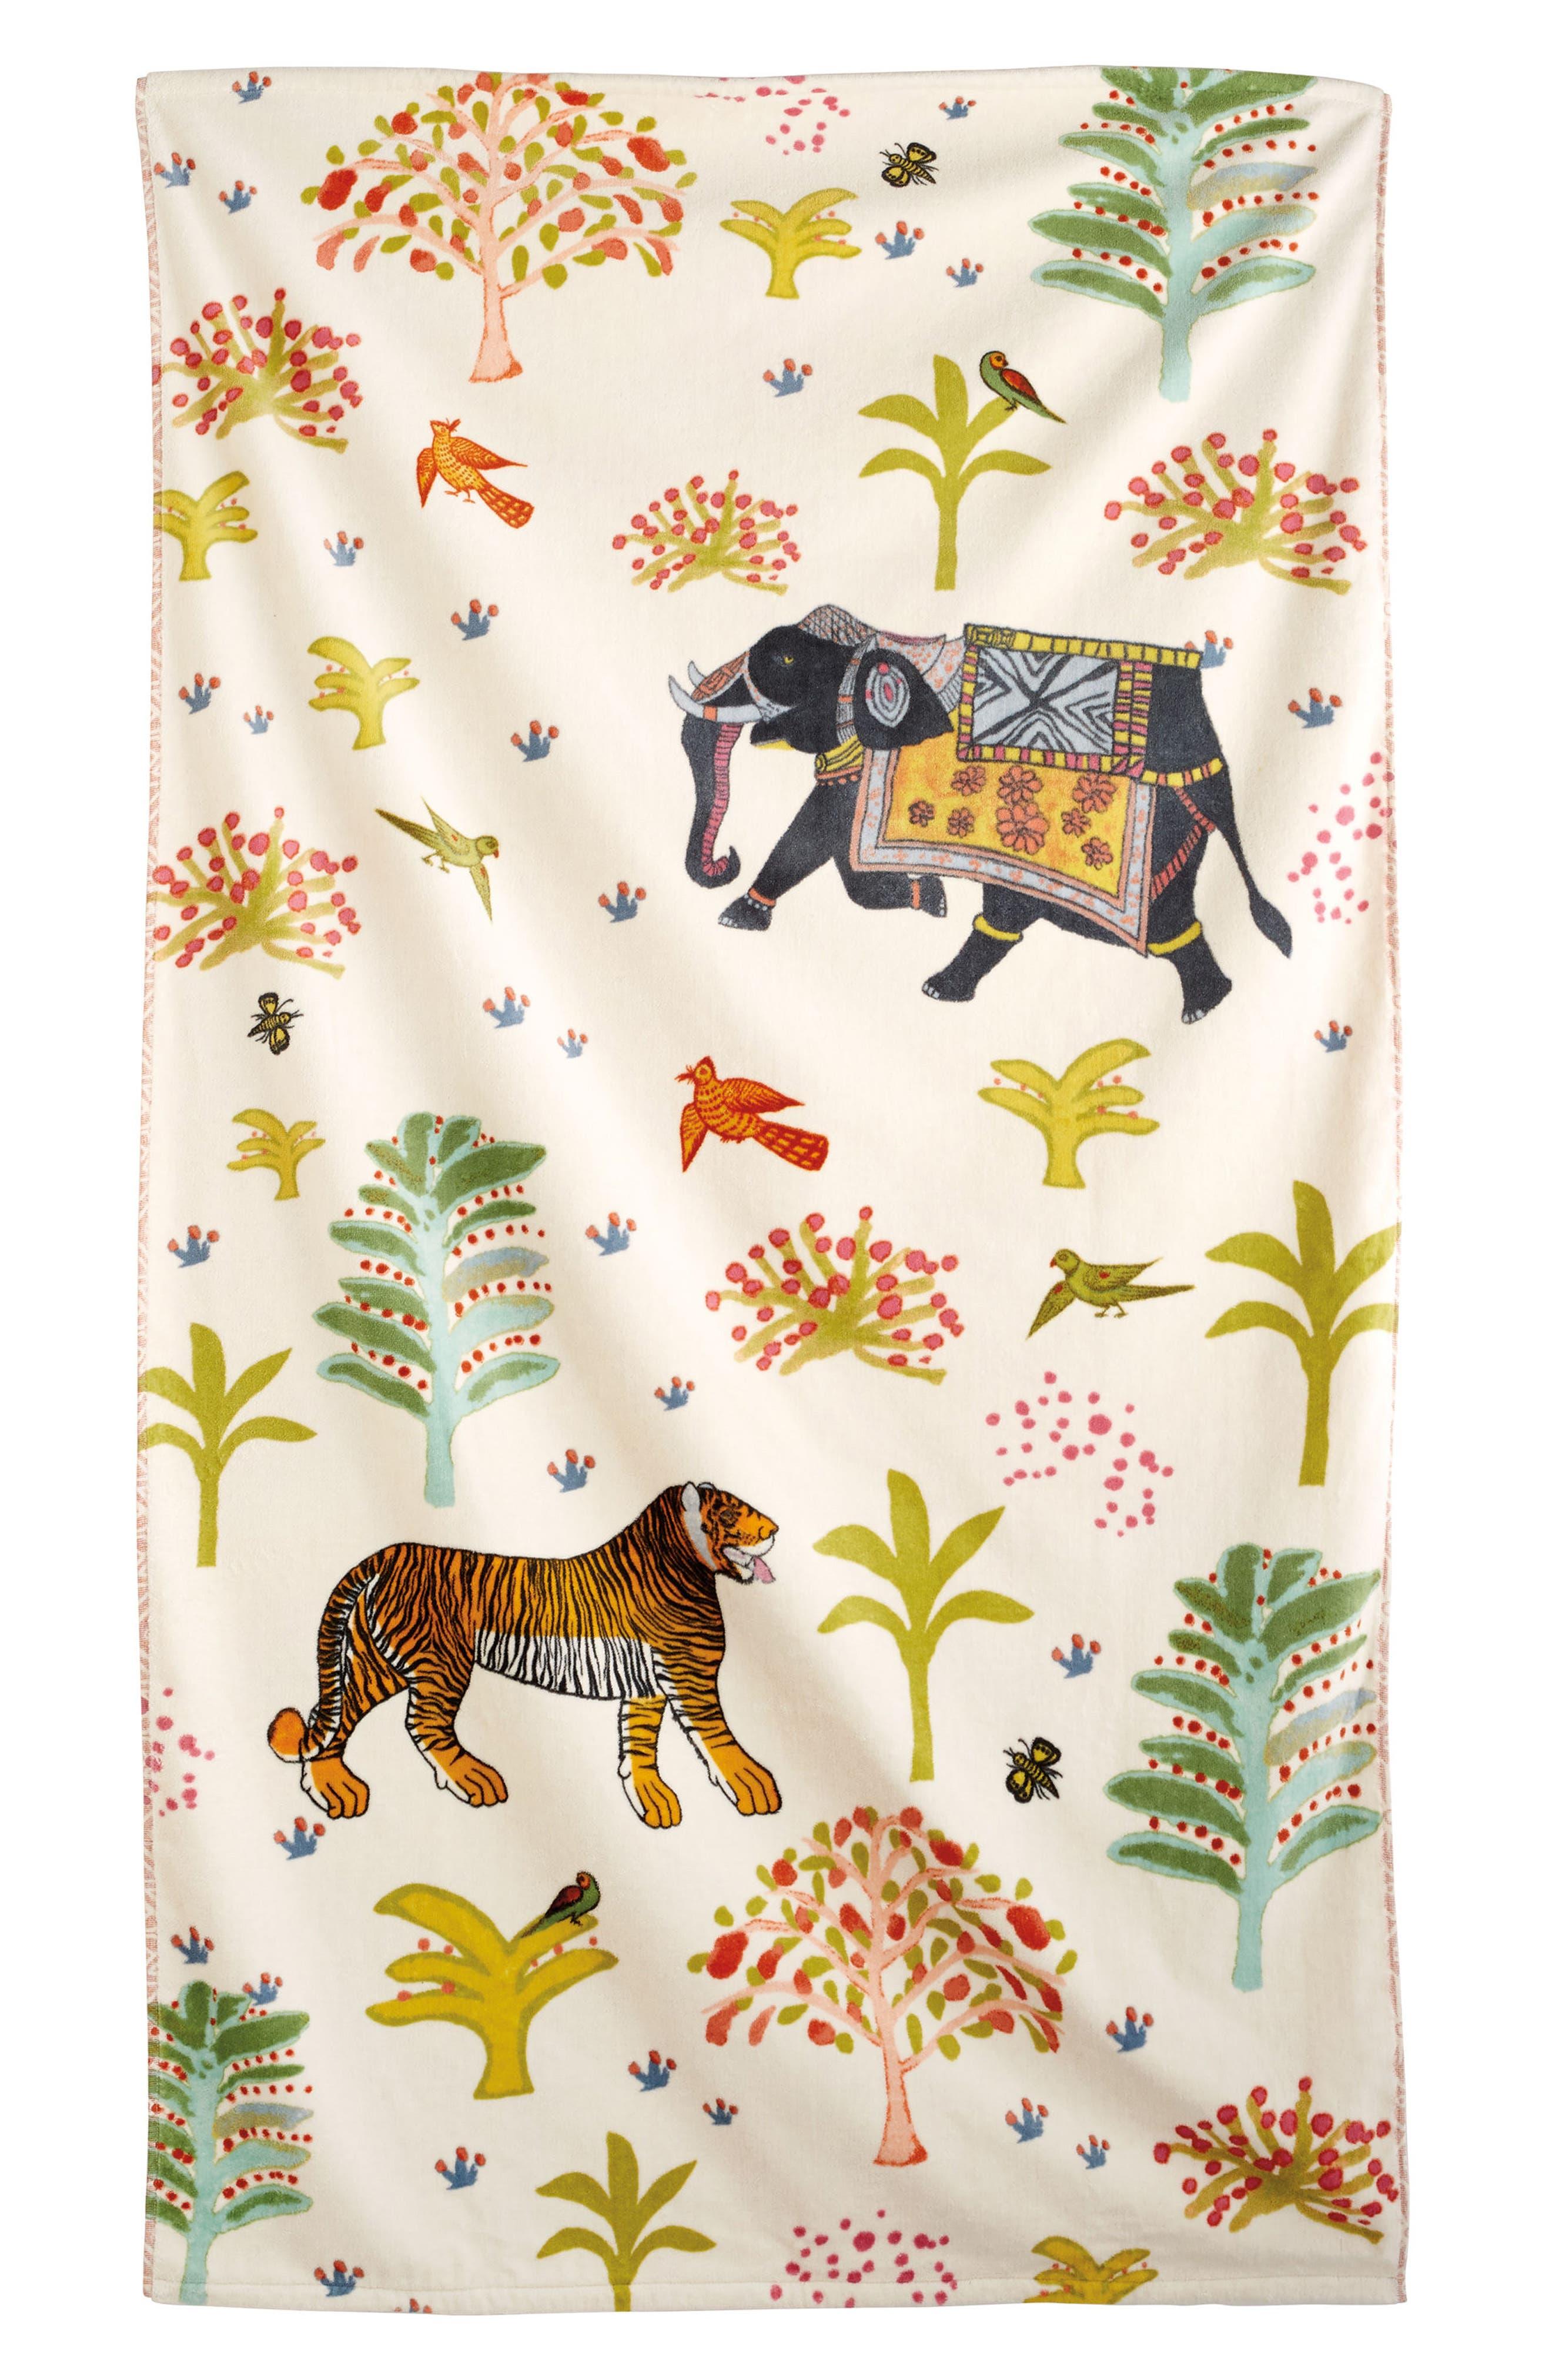 Masai Mara Resort Towel,                             Main thumbnail 1, color,                             Cream Ground